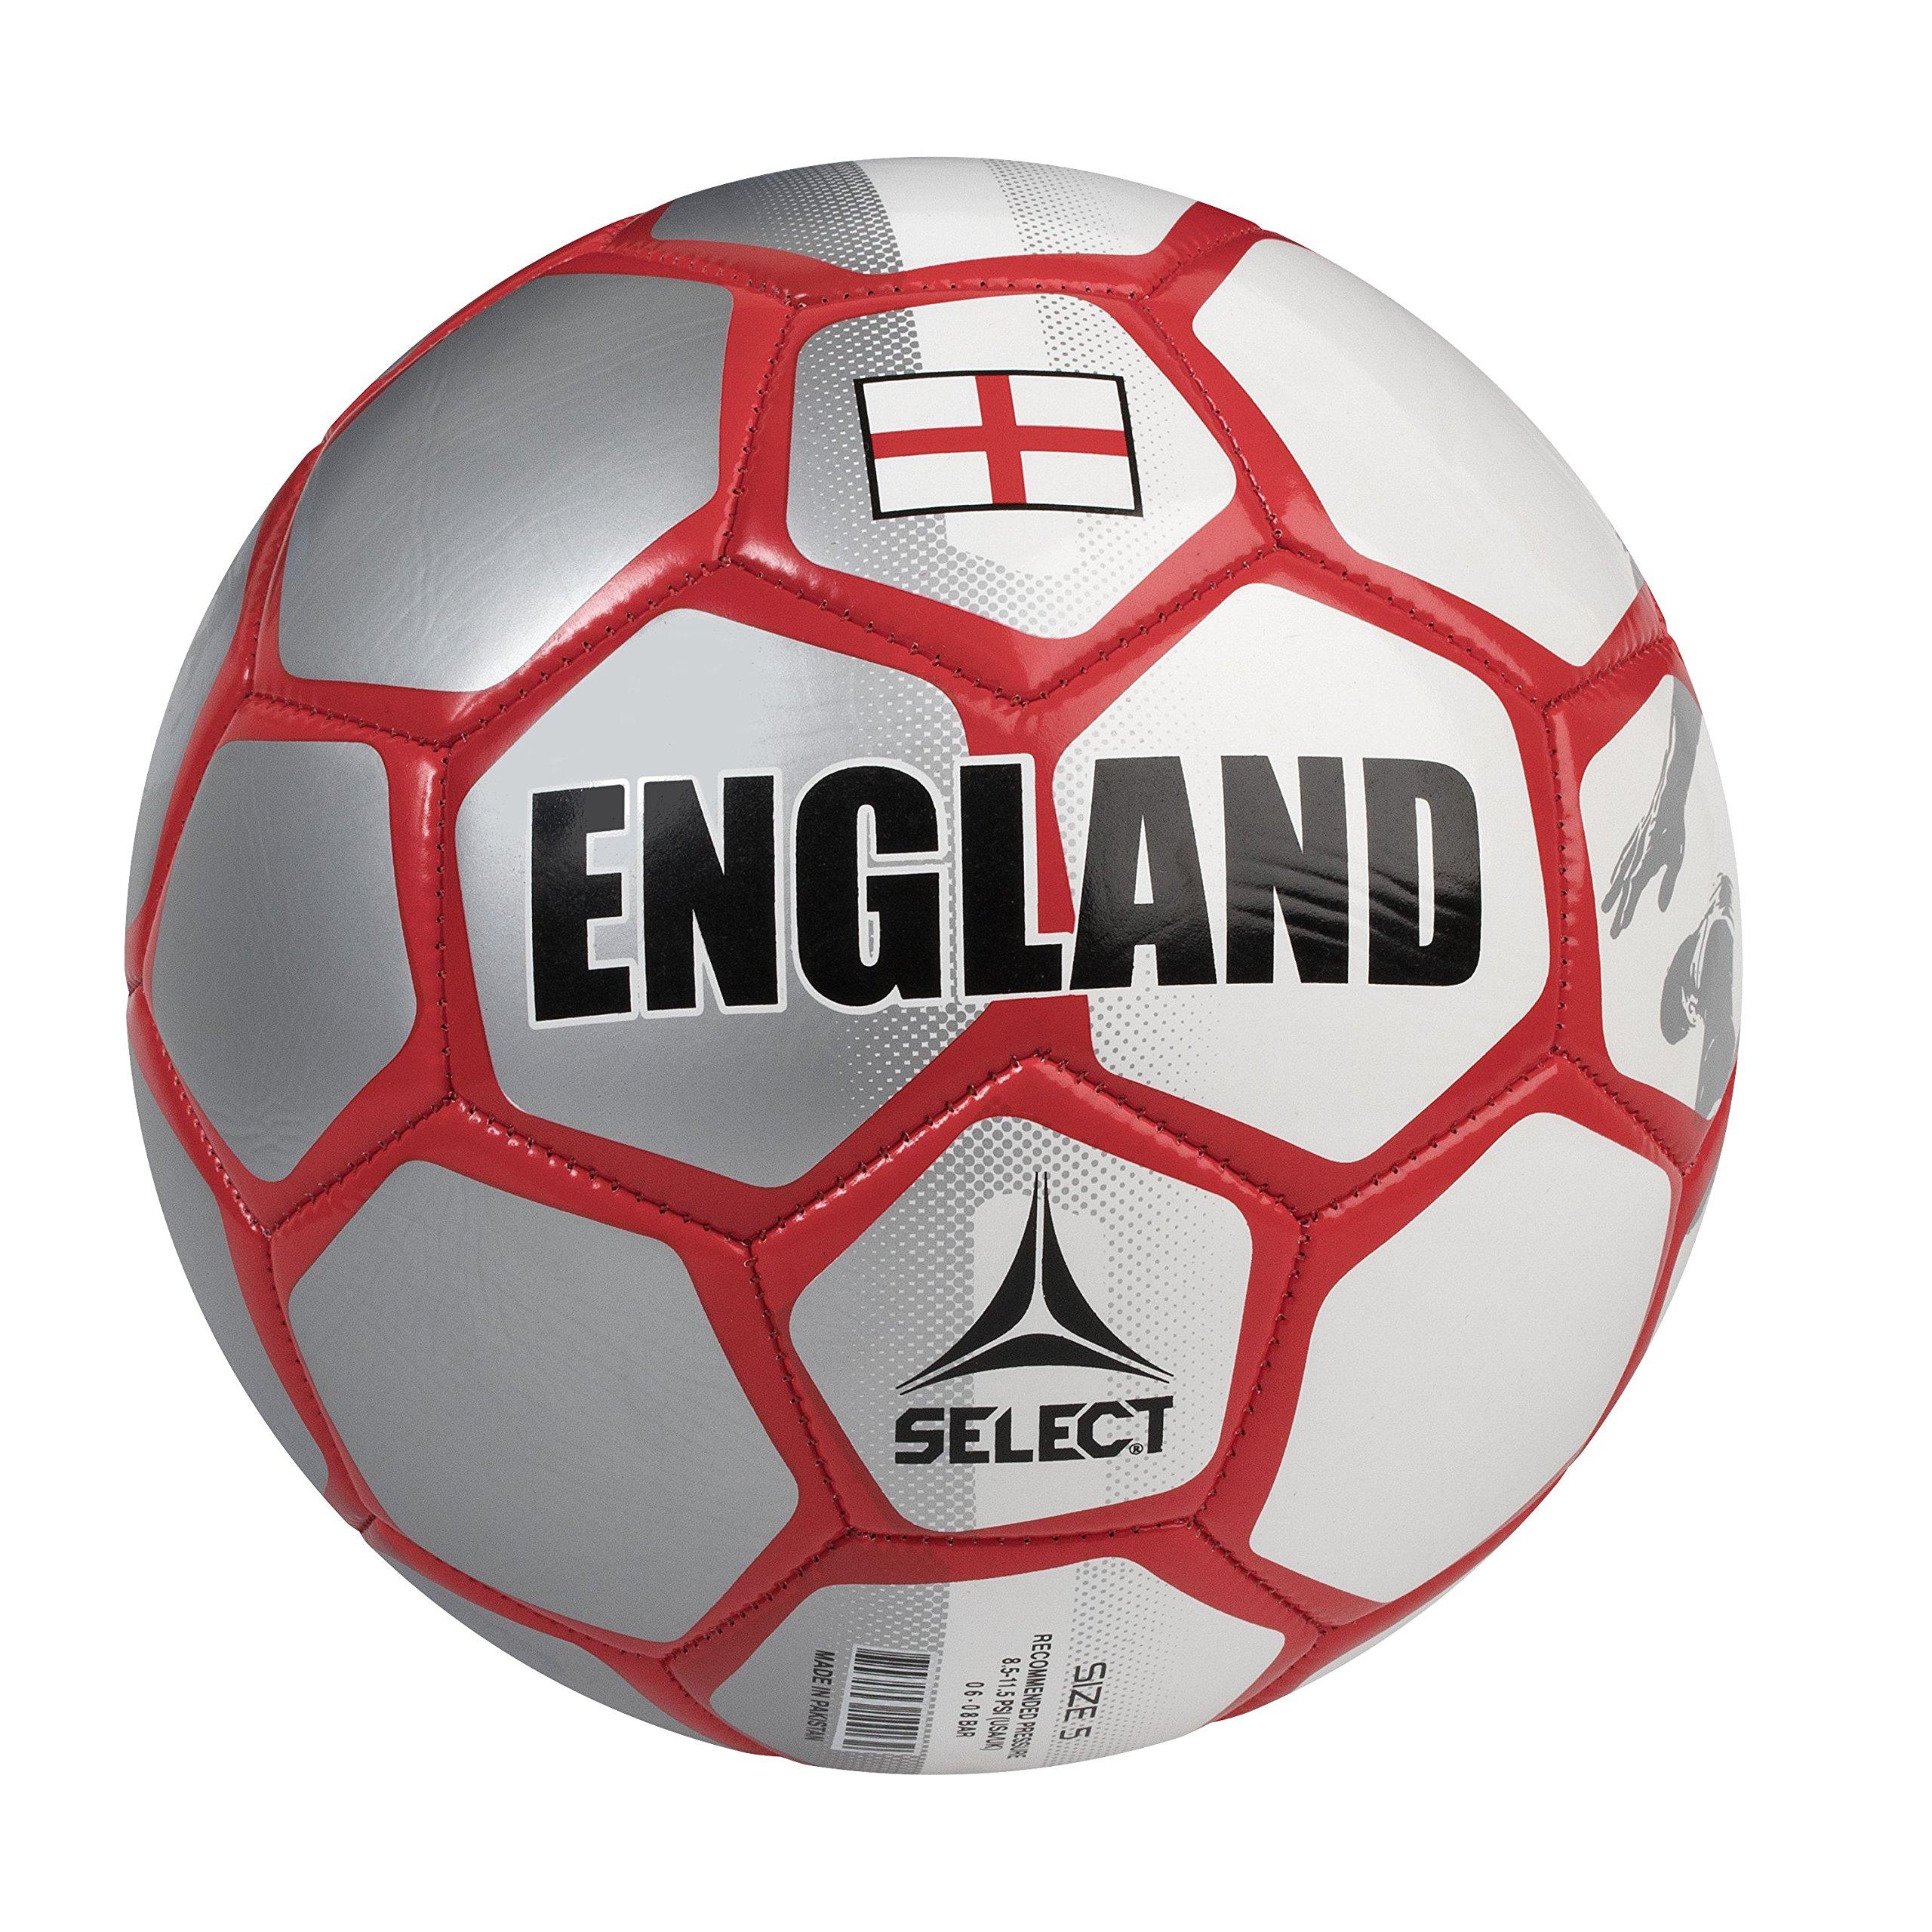 SELECT England World Cup Country Soccer Ball - Skills Ball - 47 cm